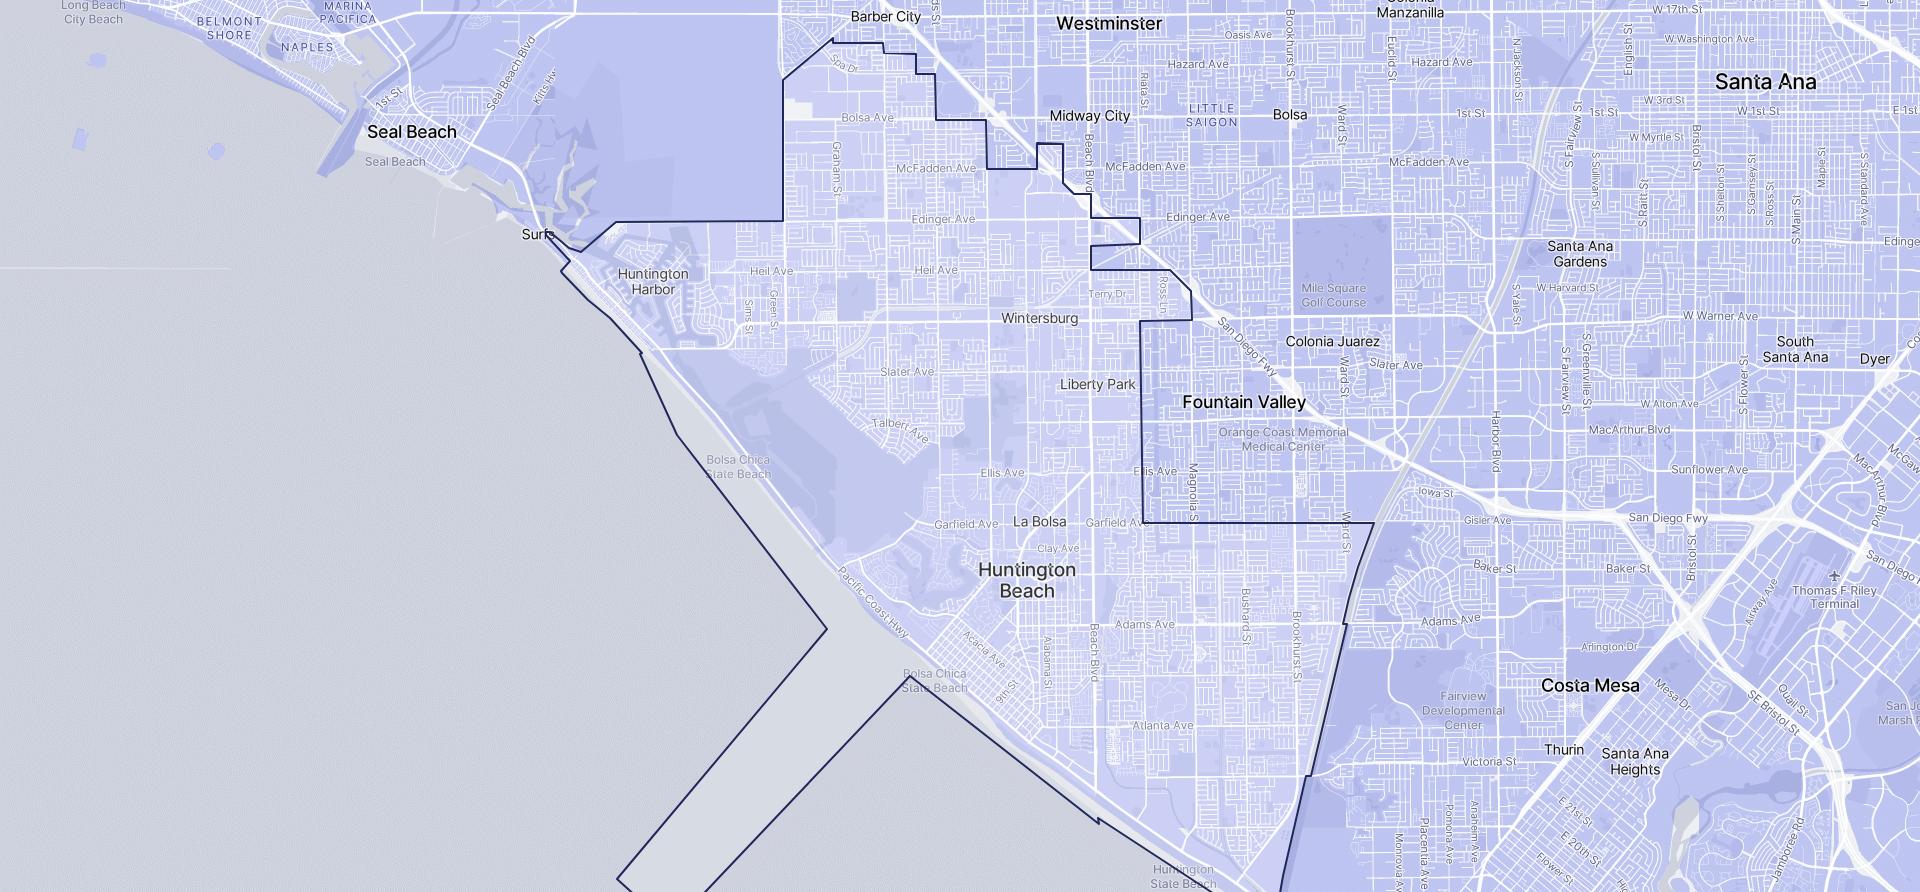 Image of Huntington Beach boundaries on a map.